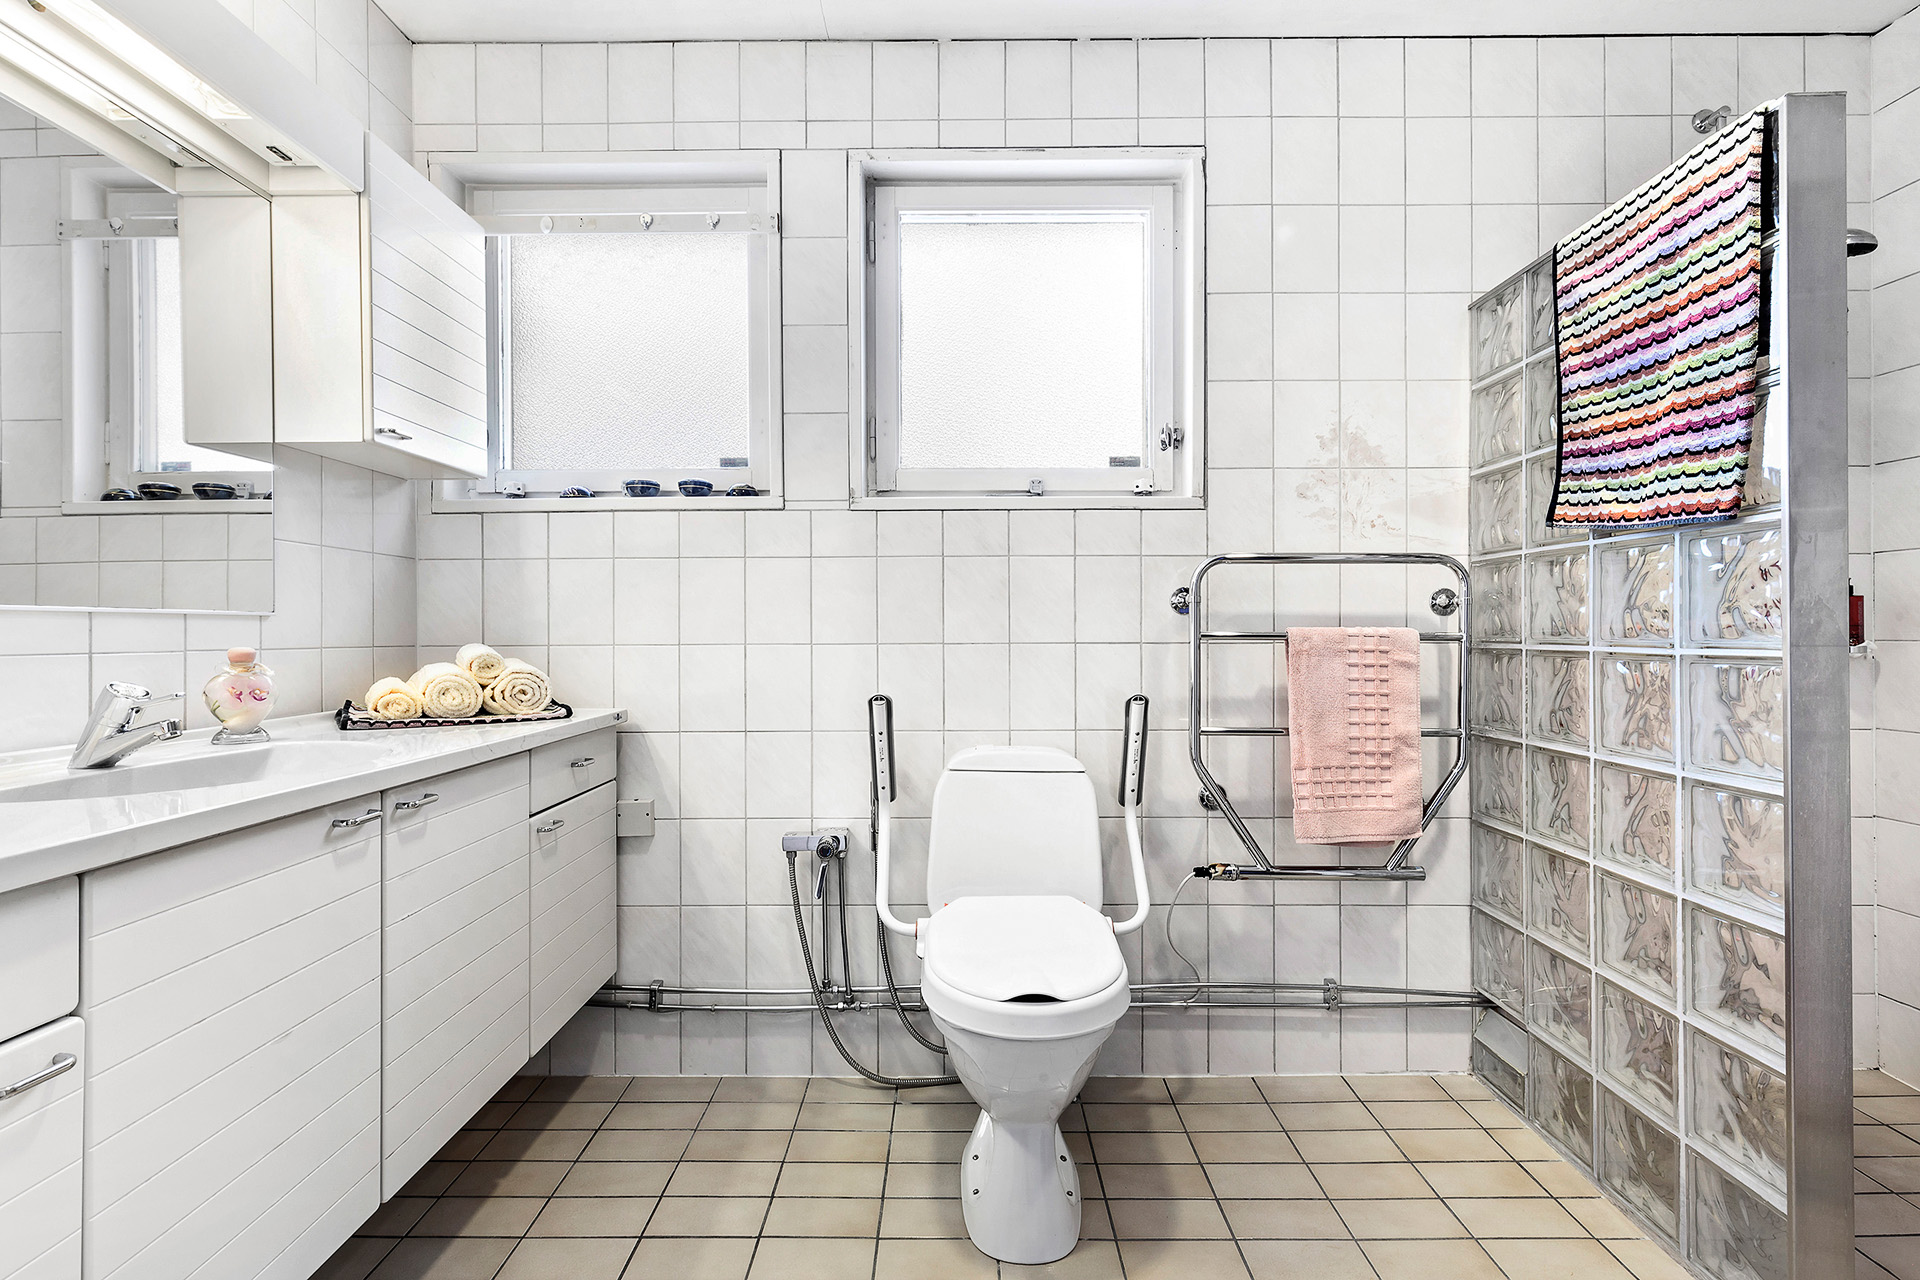 Duschrum med bastu